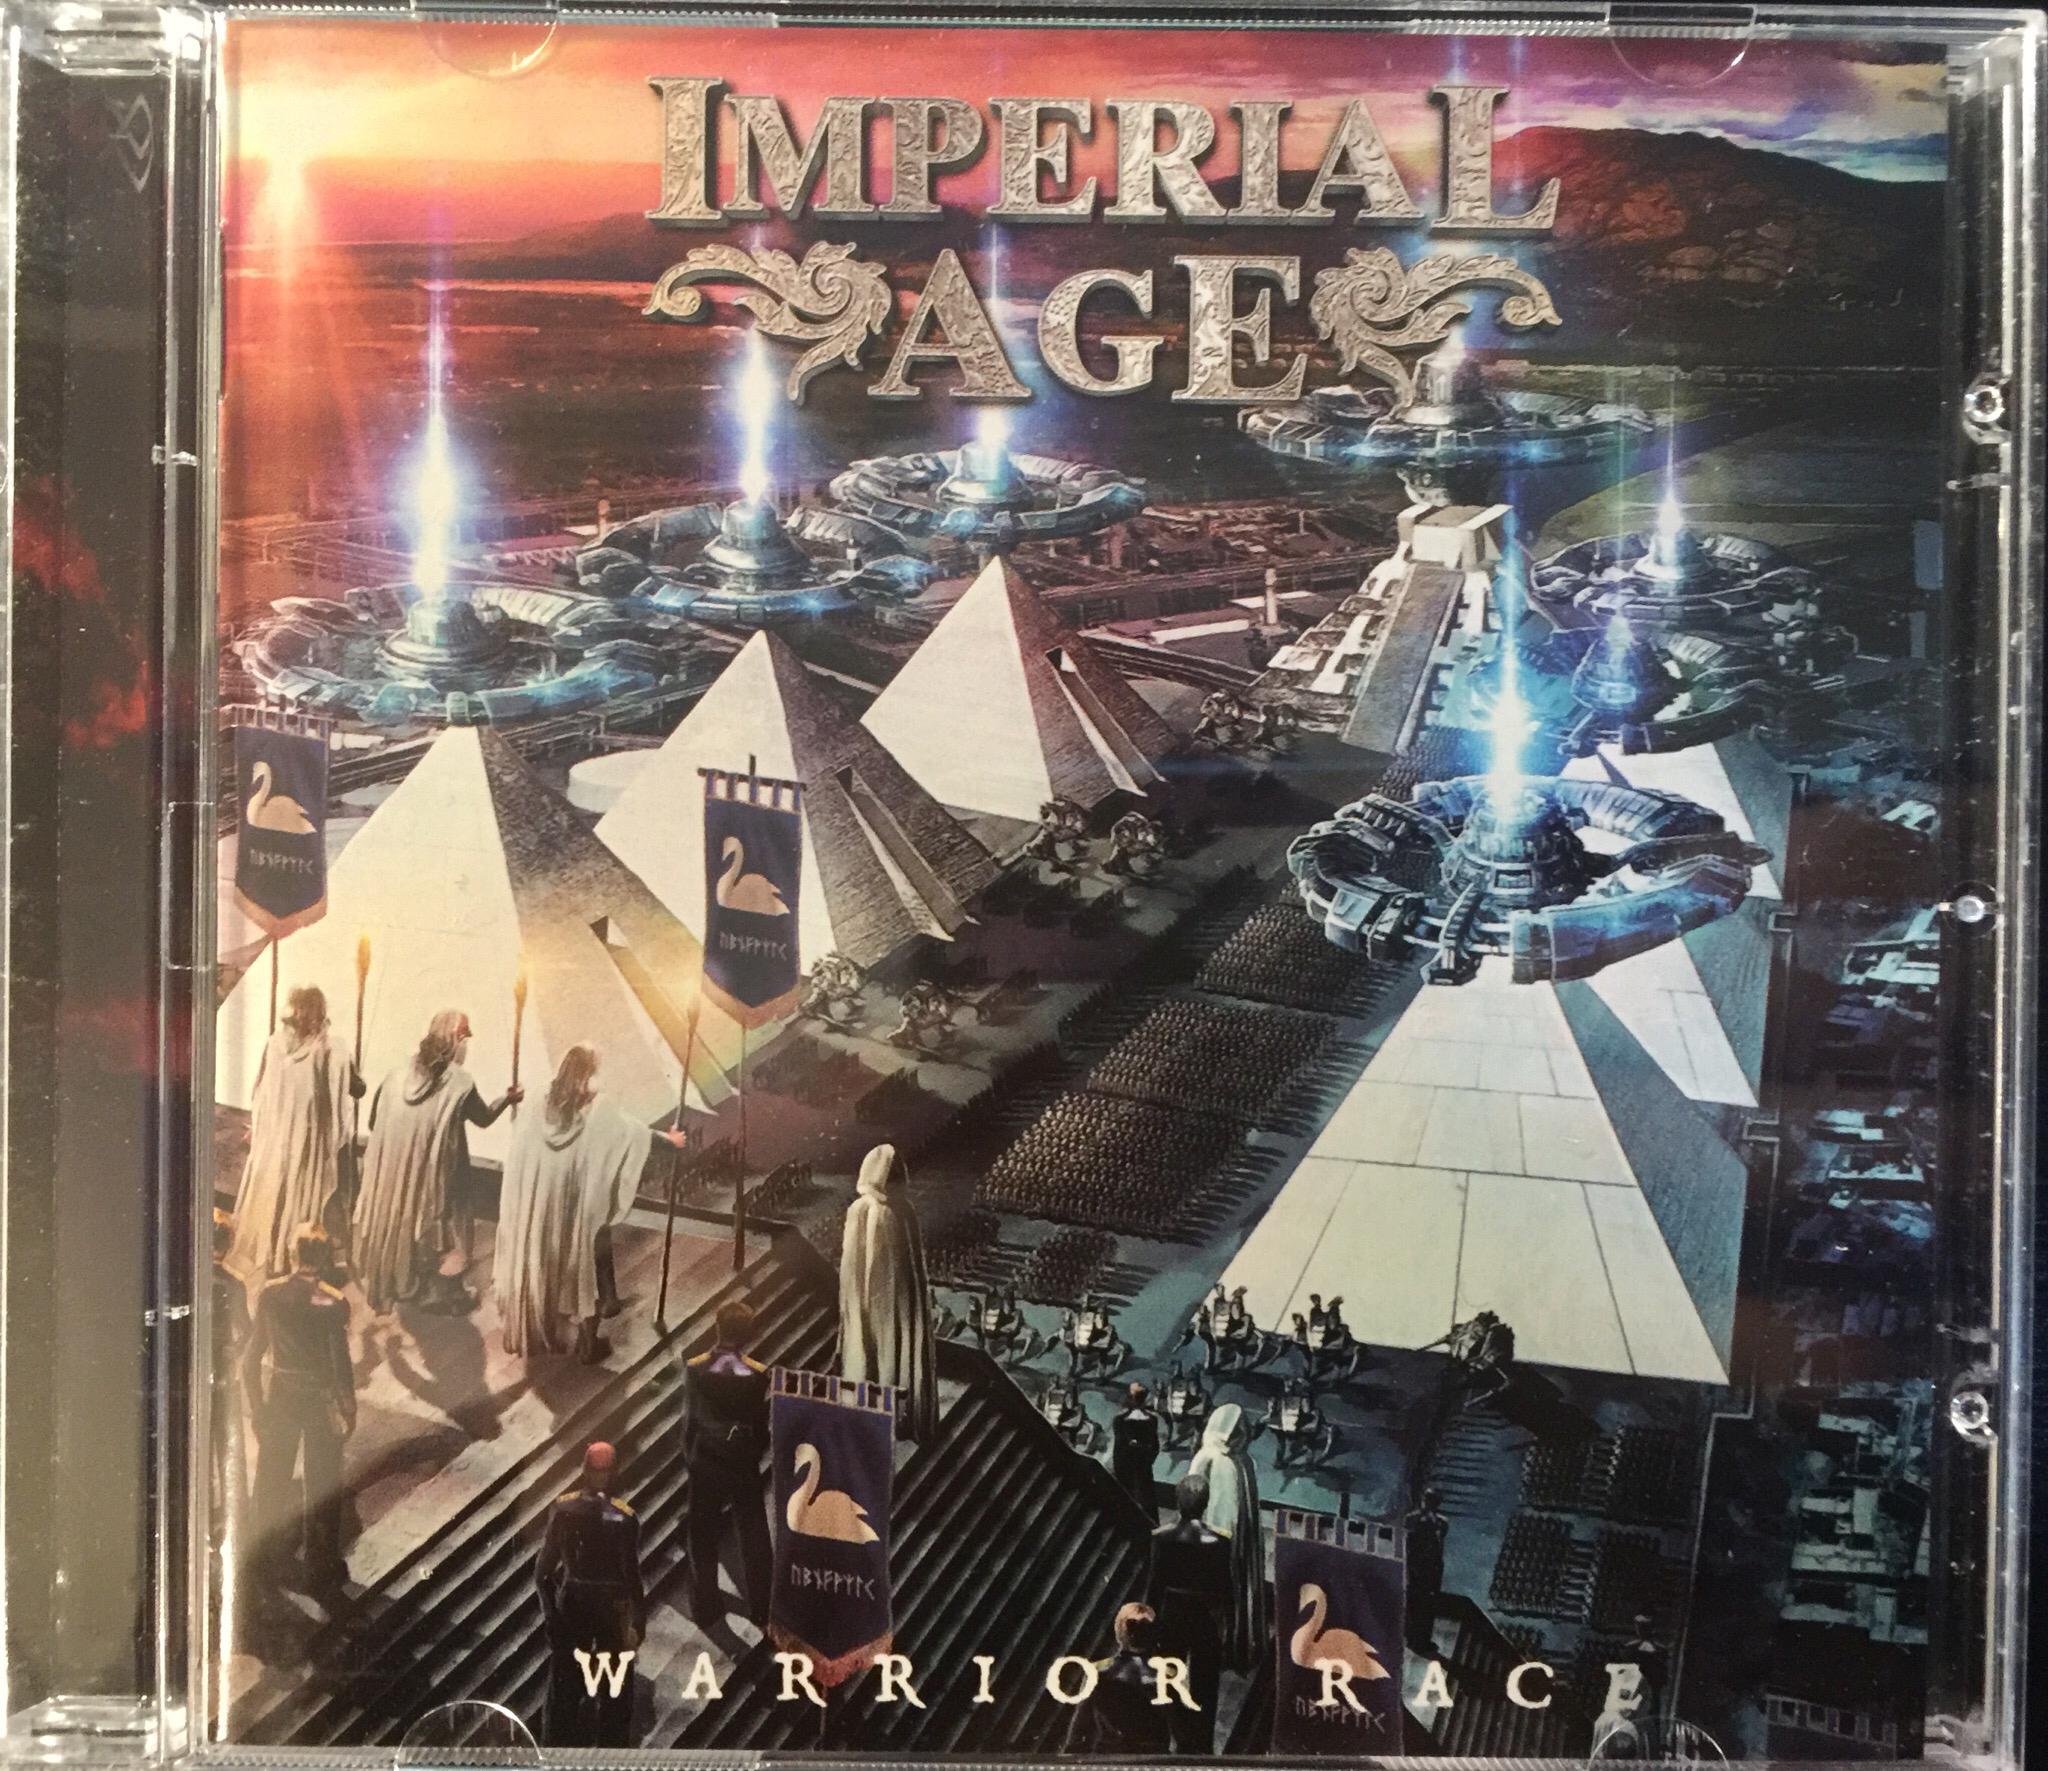 Warrior Race [CD Jewelcase]